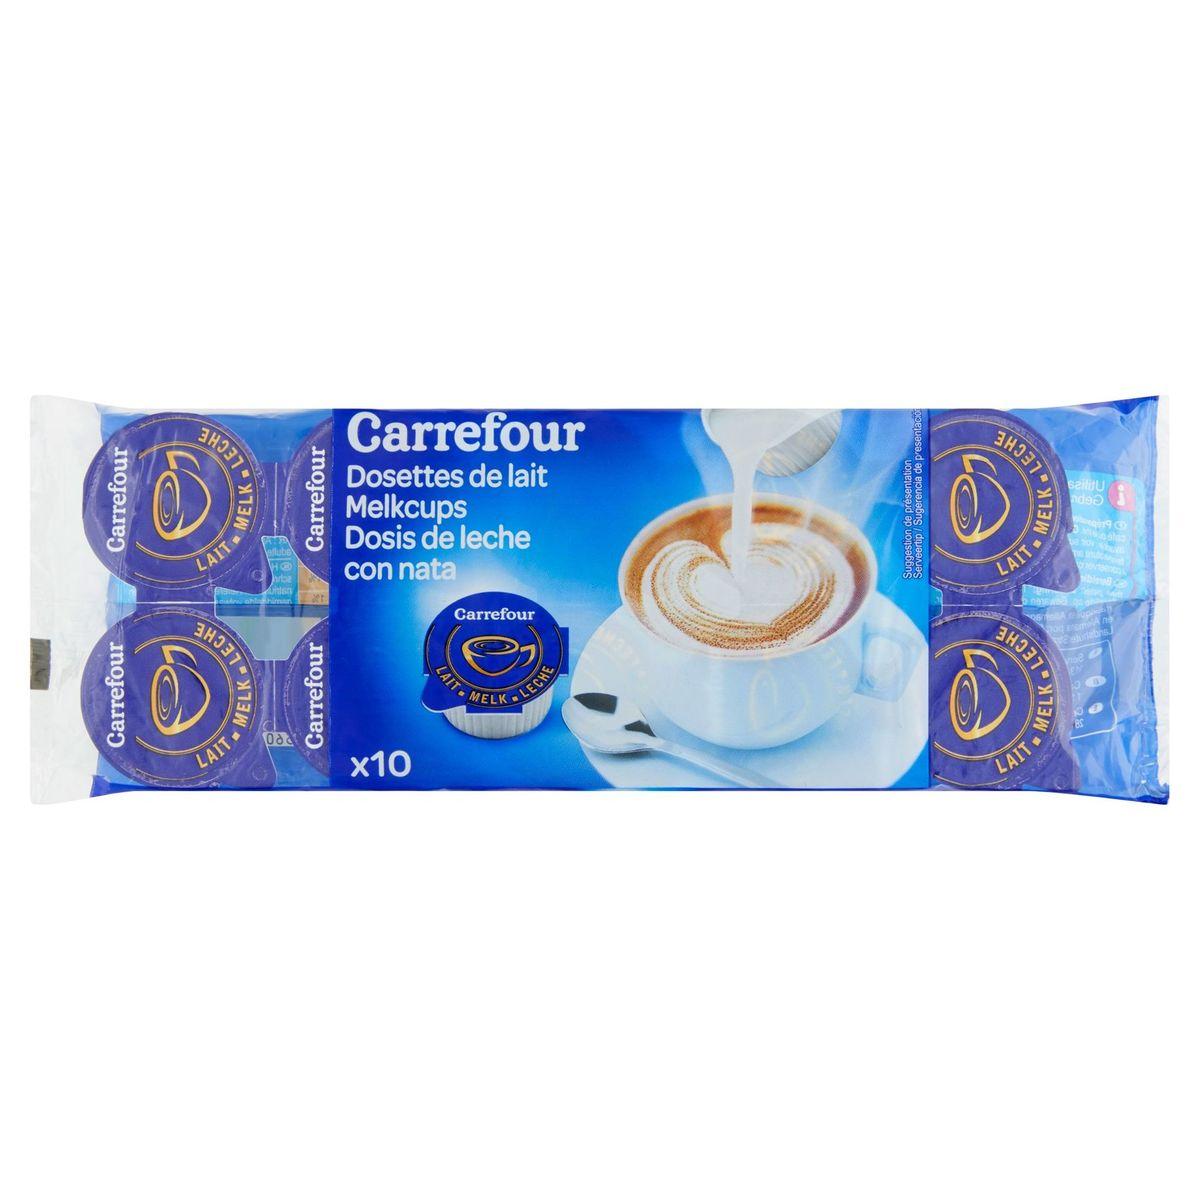 Carrefour Melkcups 10 x 9.7 ml